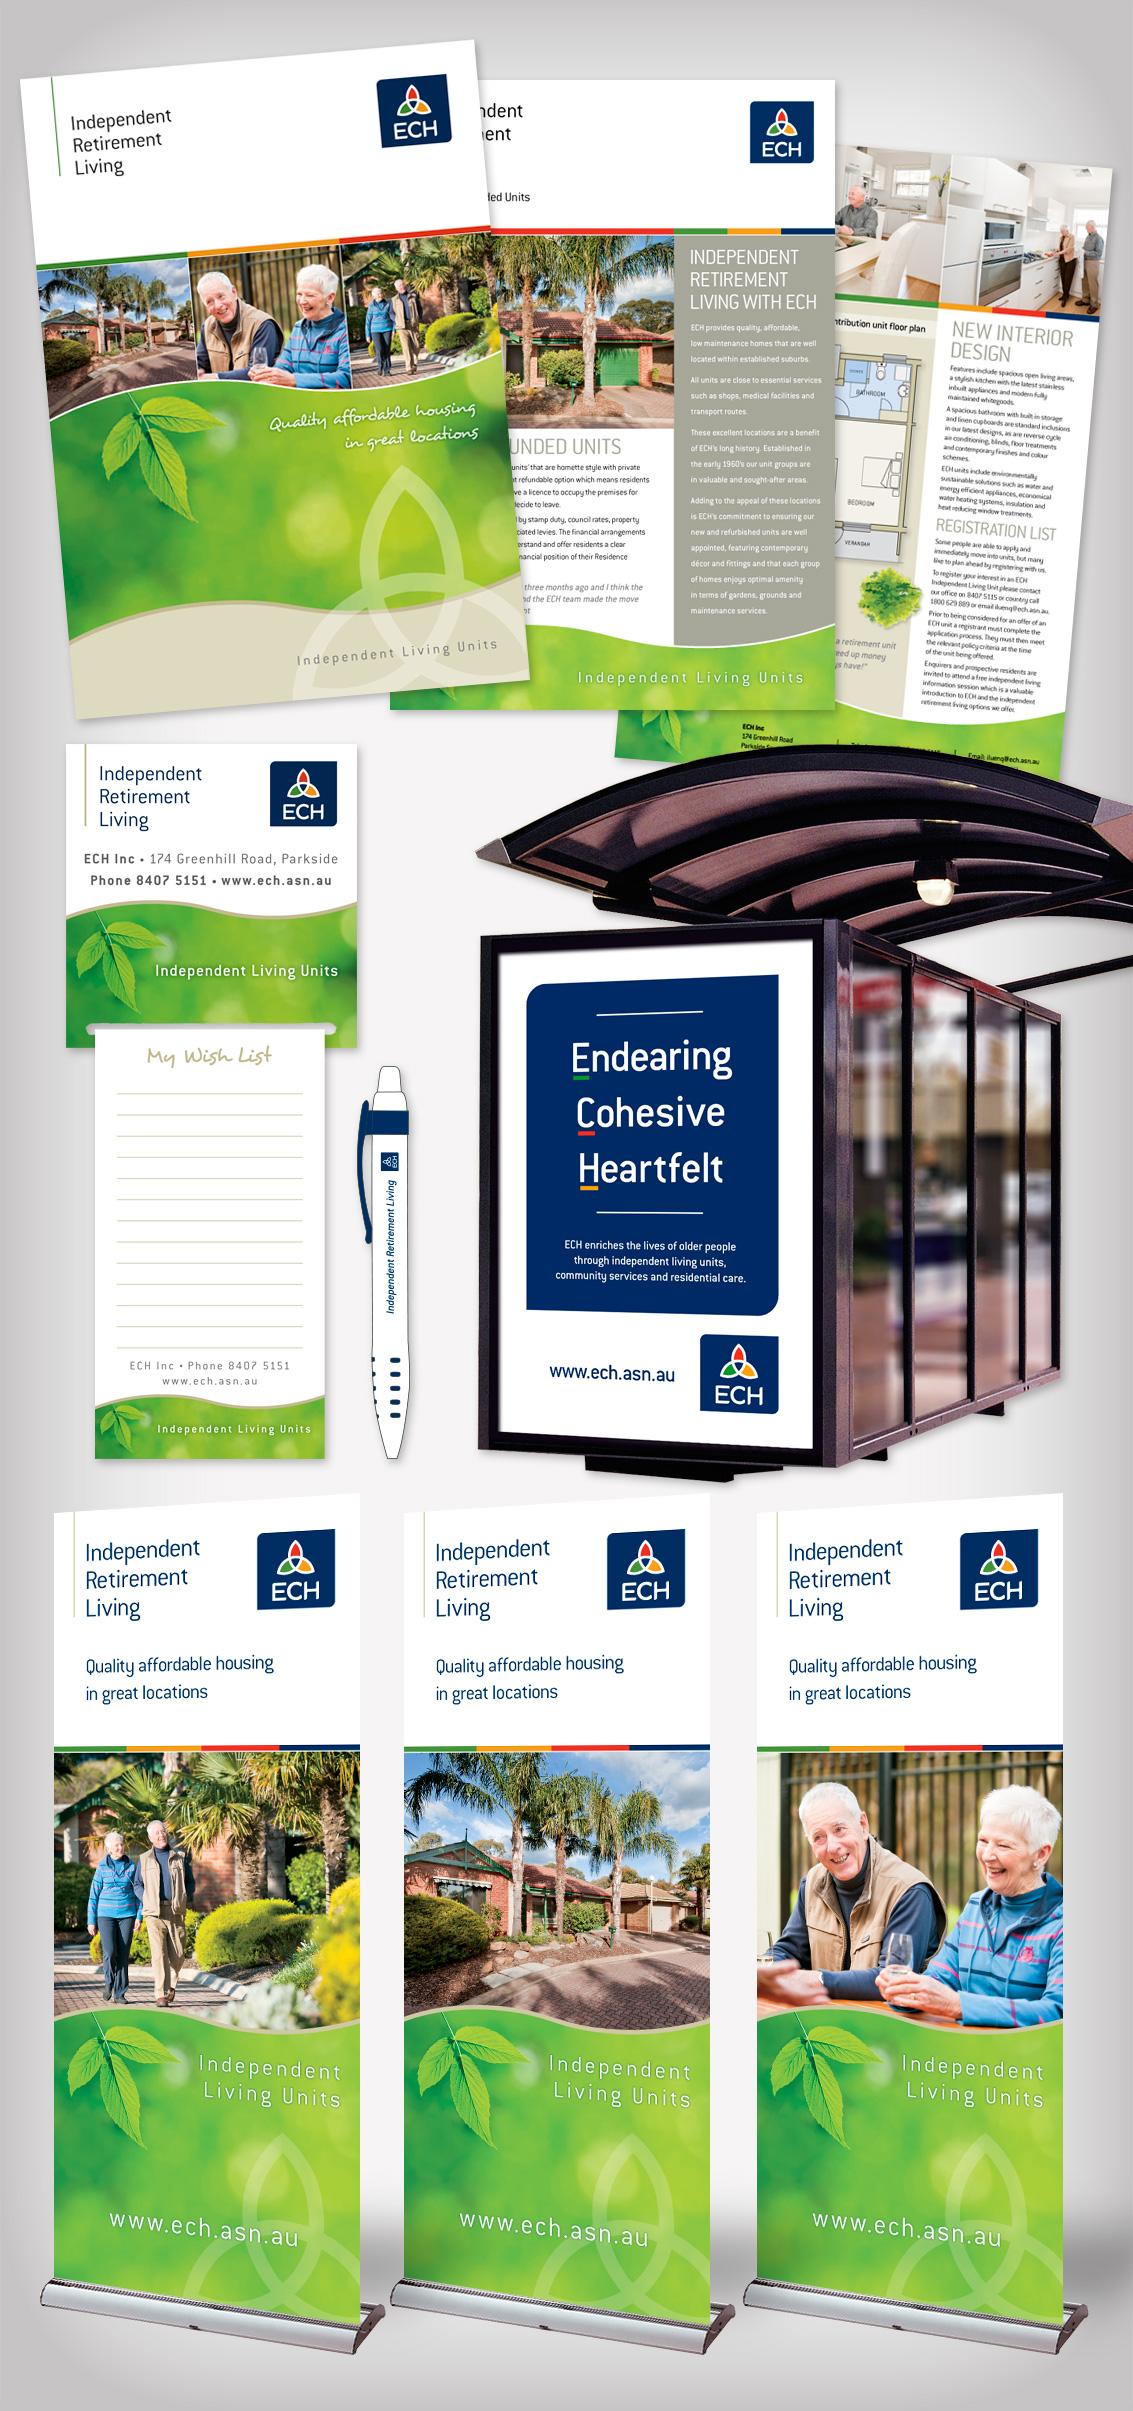 NrG Advertising - ECH ILU Rebranding